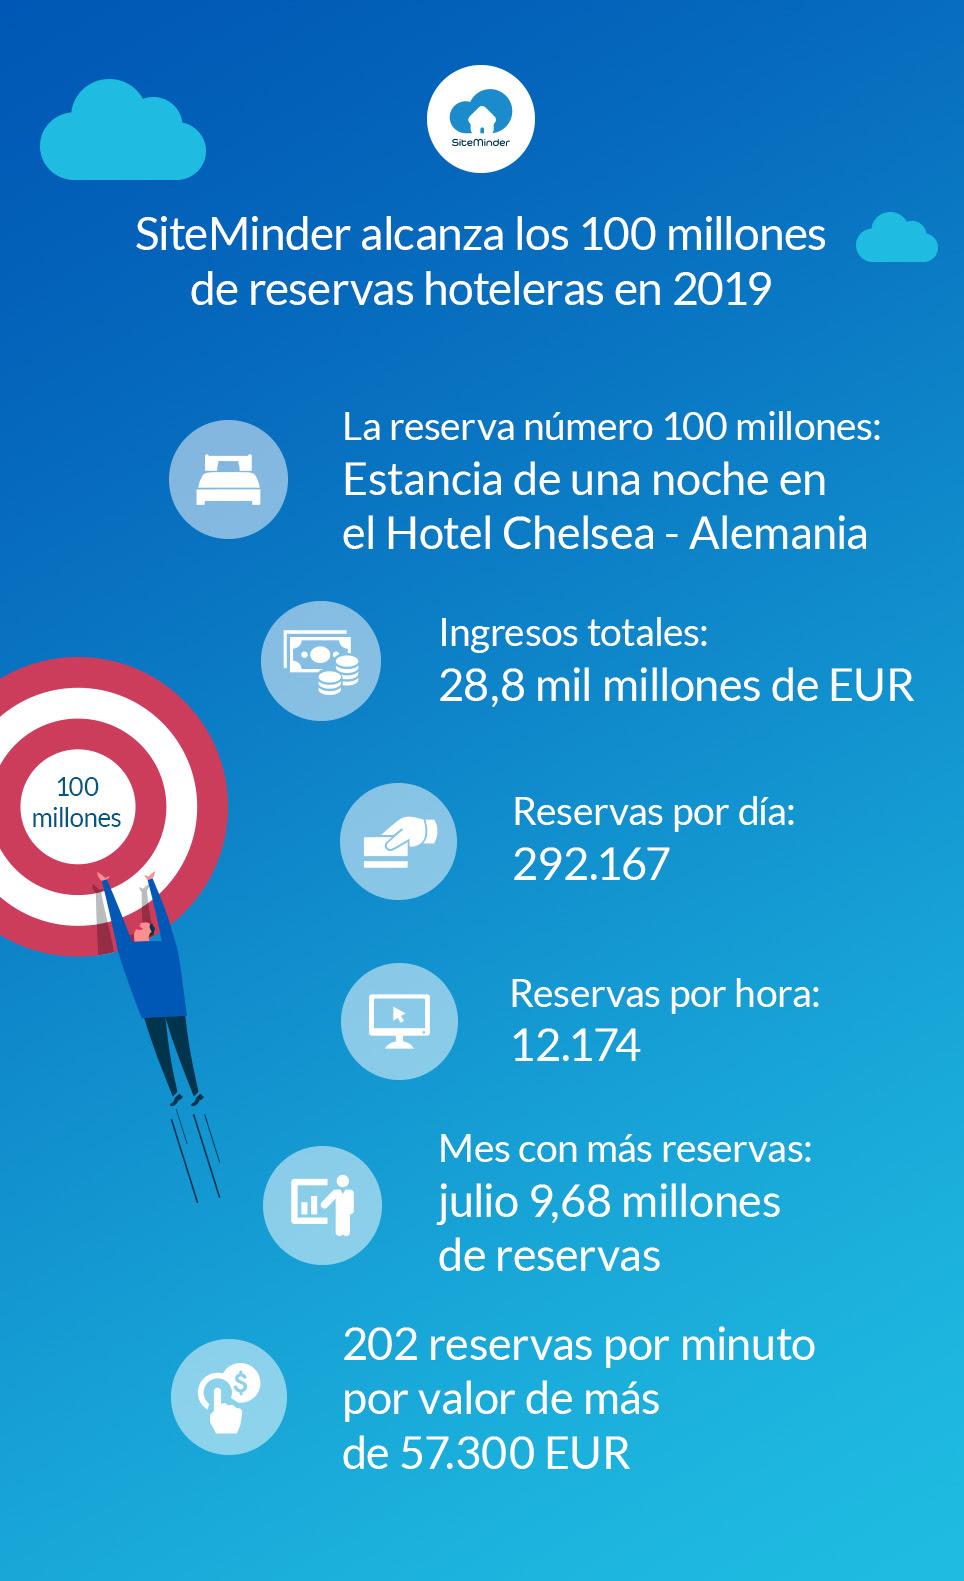 SiteMinder 100 million bookings